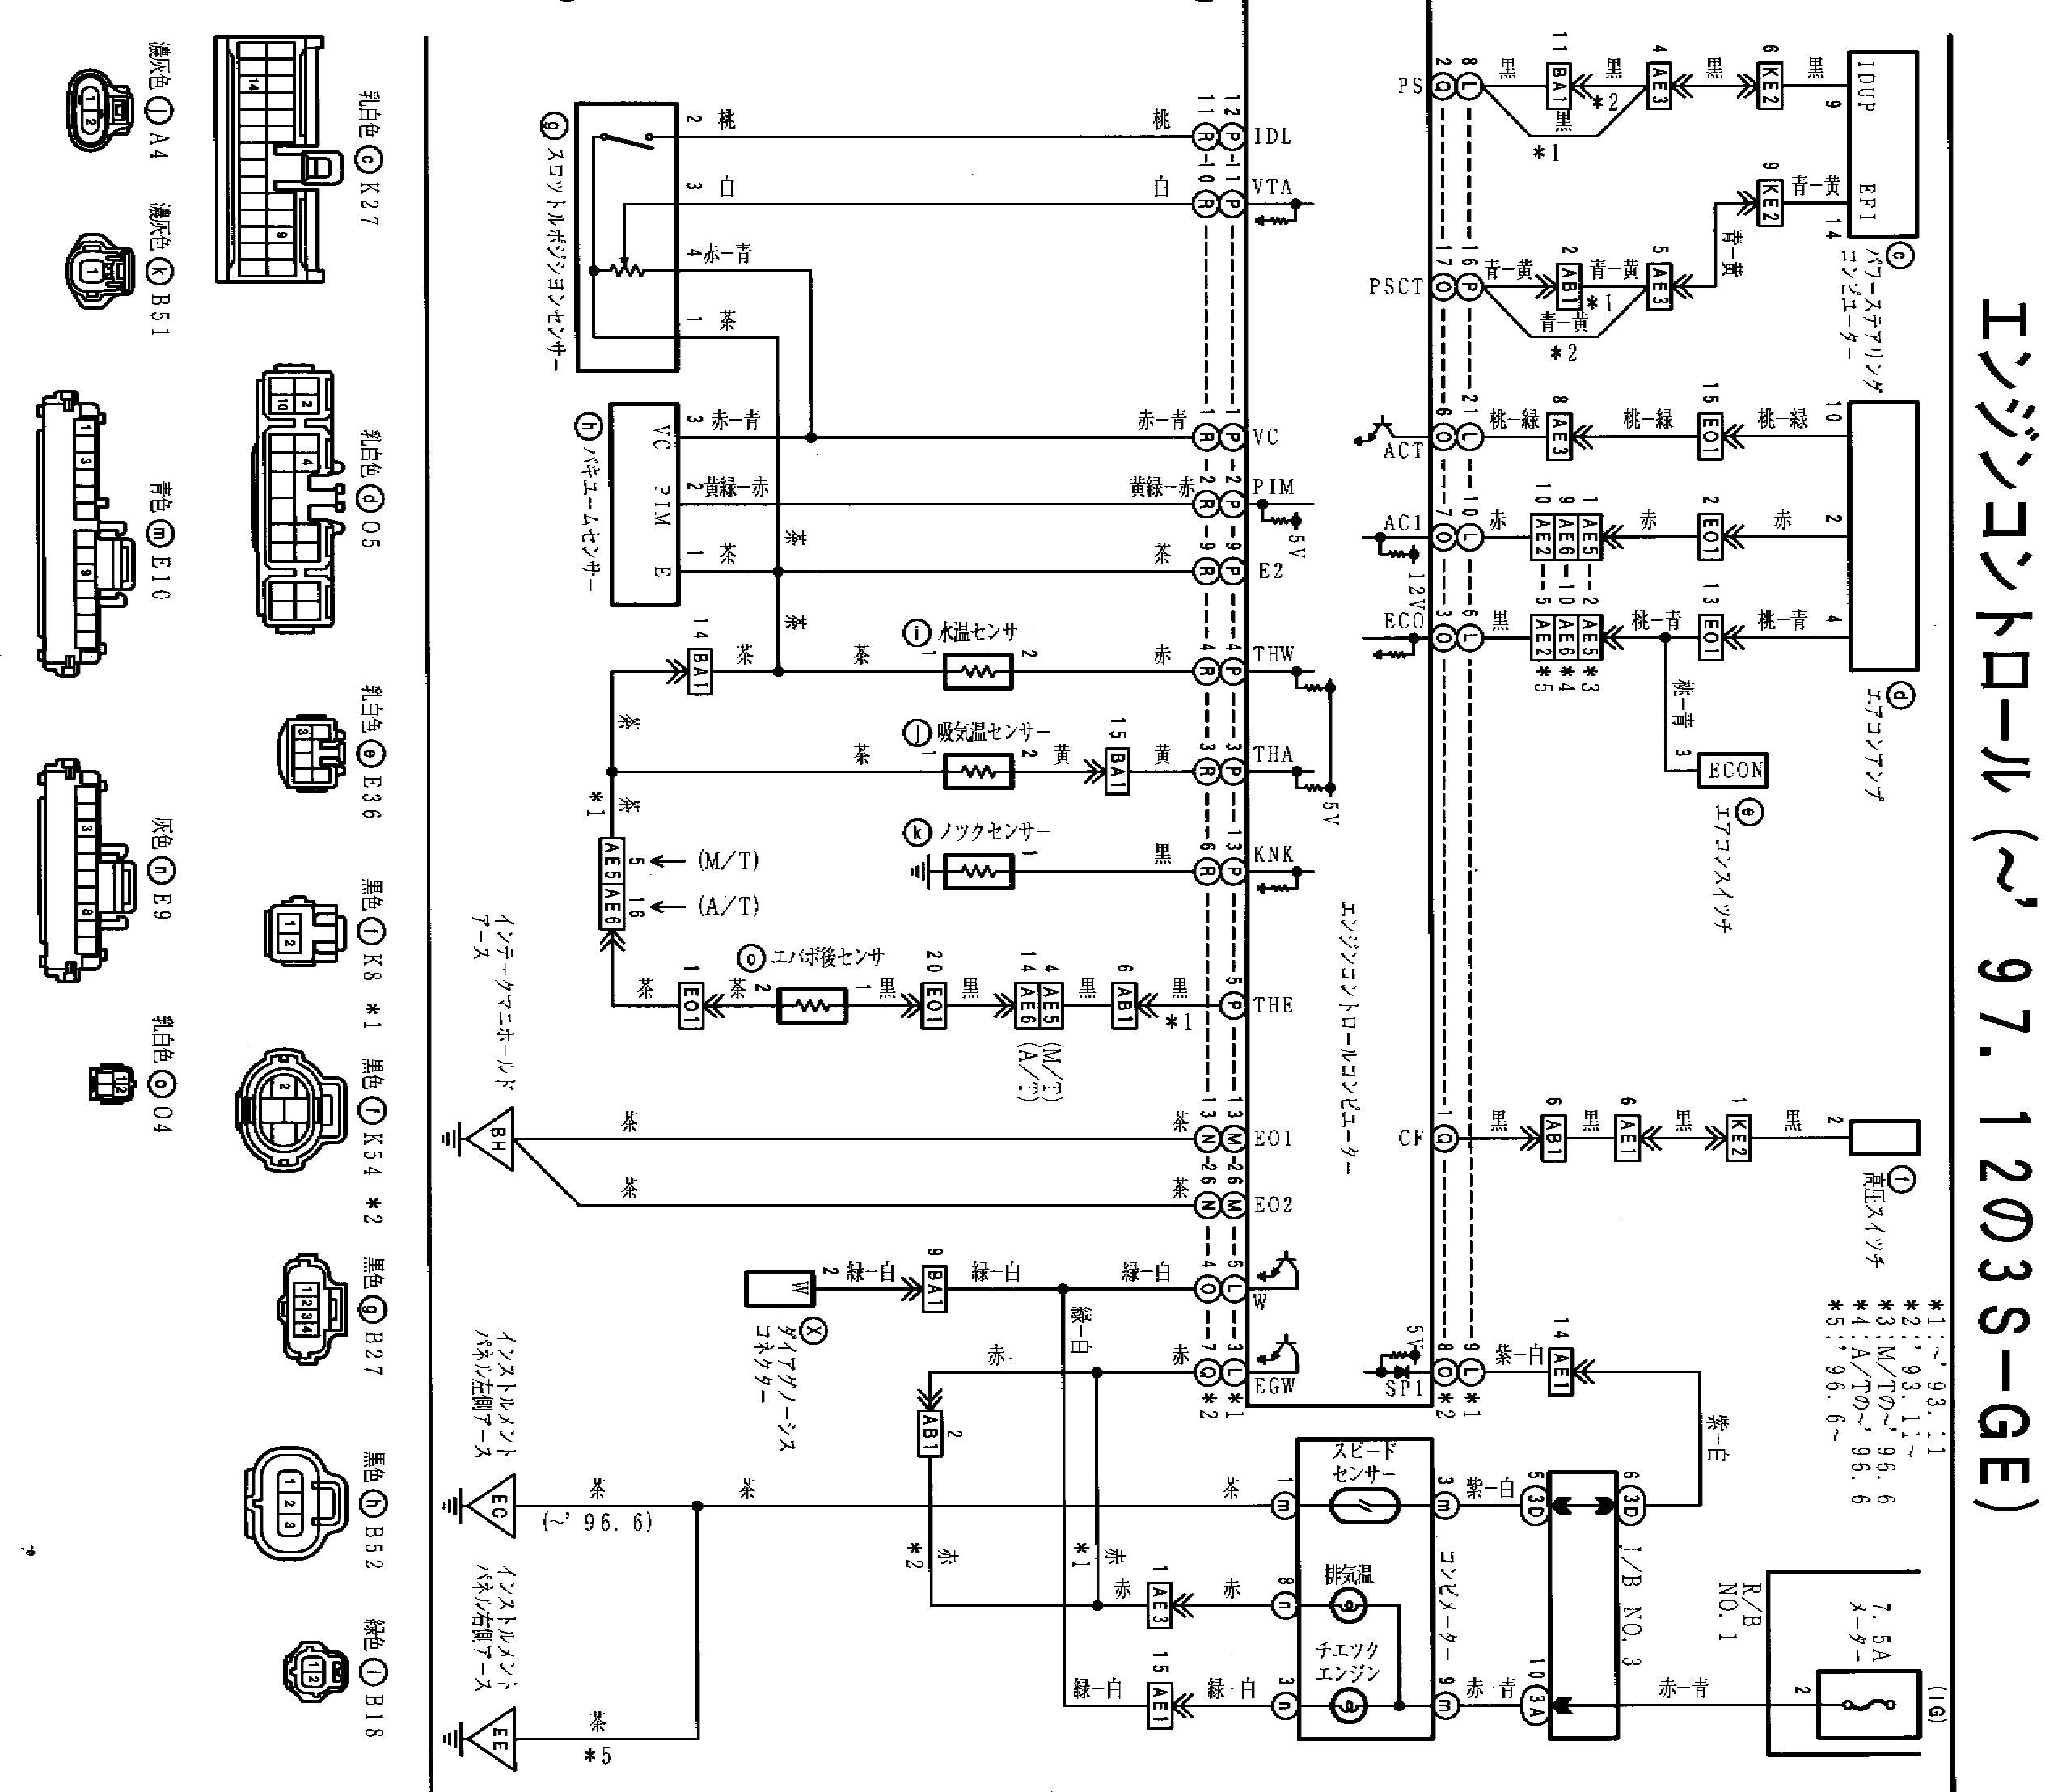 Wiring Diagram Avanza 2007  Diagram  Diagramtemplate  Diagramsample